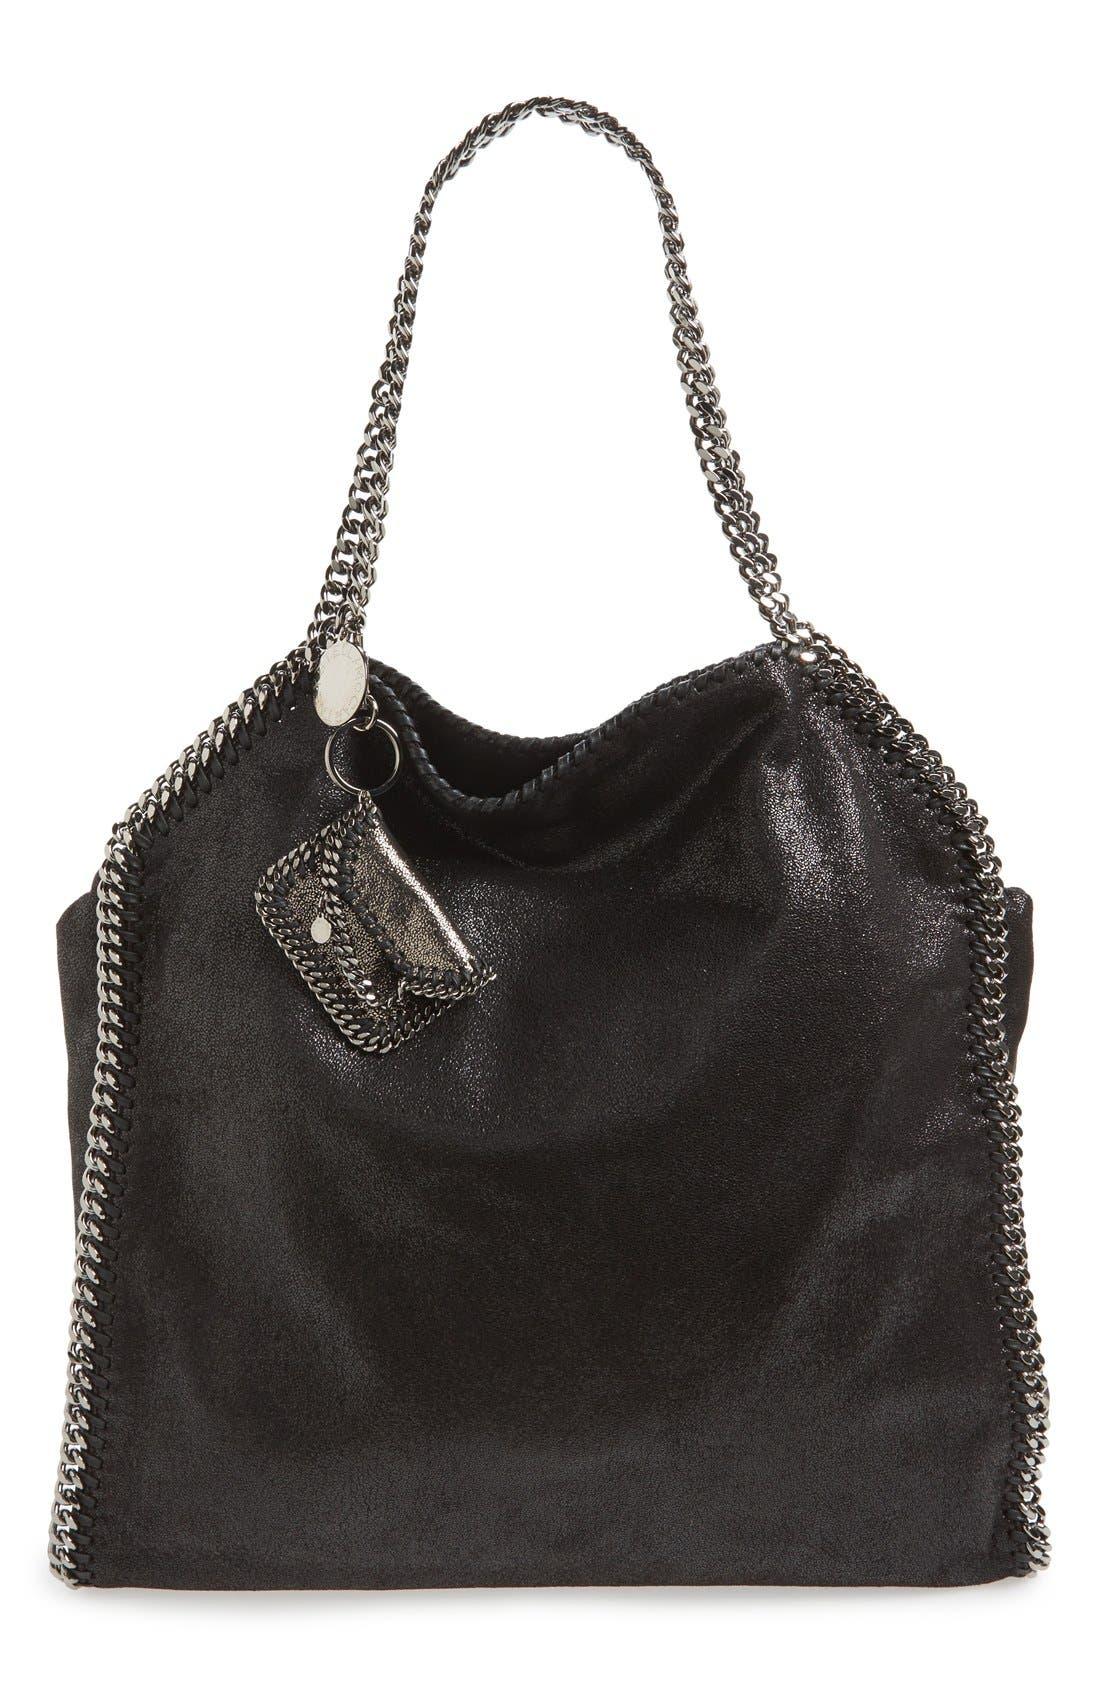 'Falabella' Bag Charm,                             Alternate thumbnail 2, color,                             Ruthenium